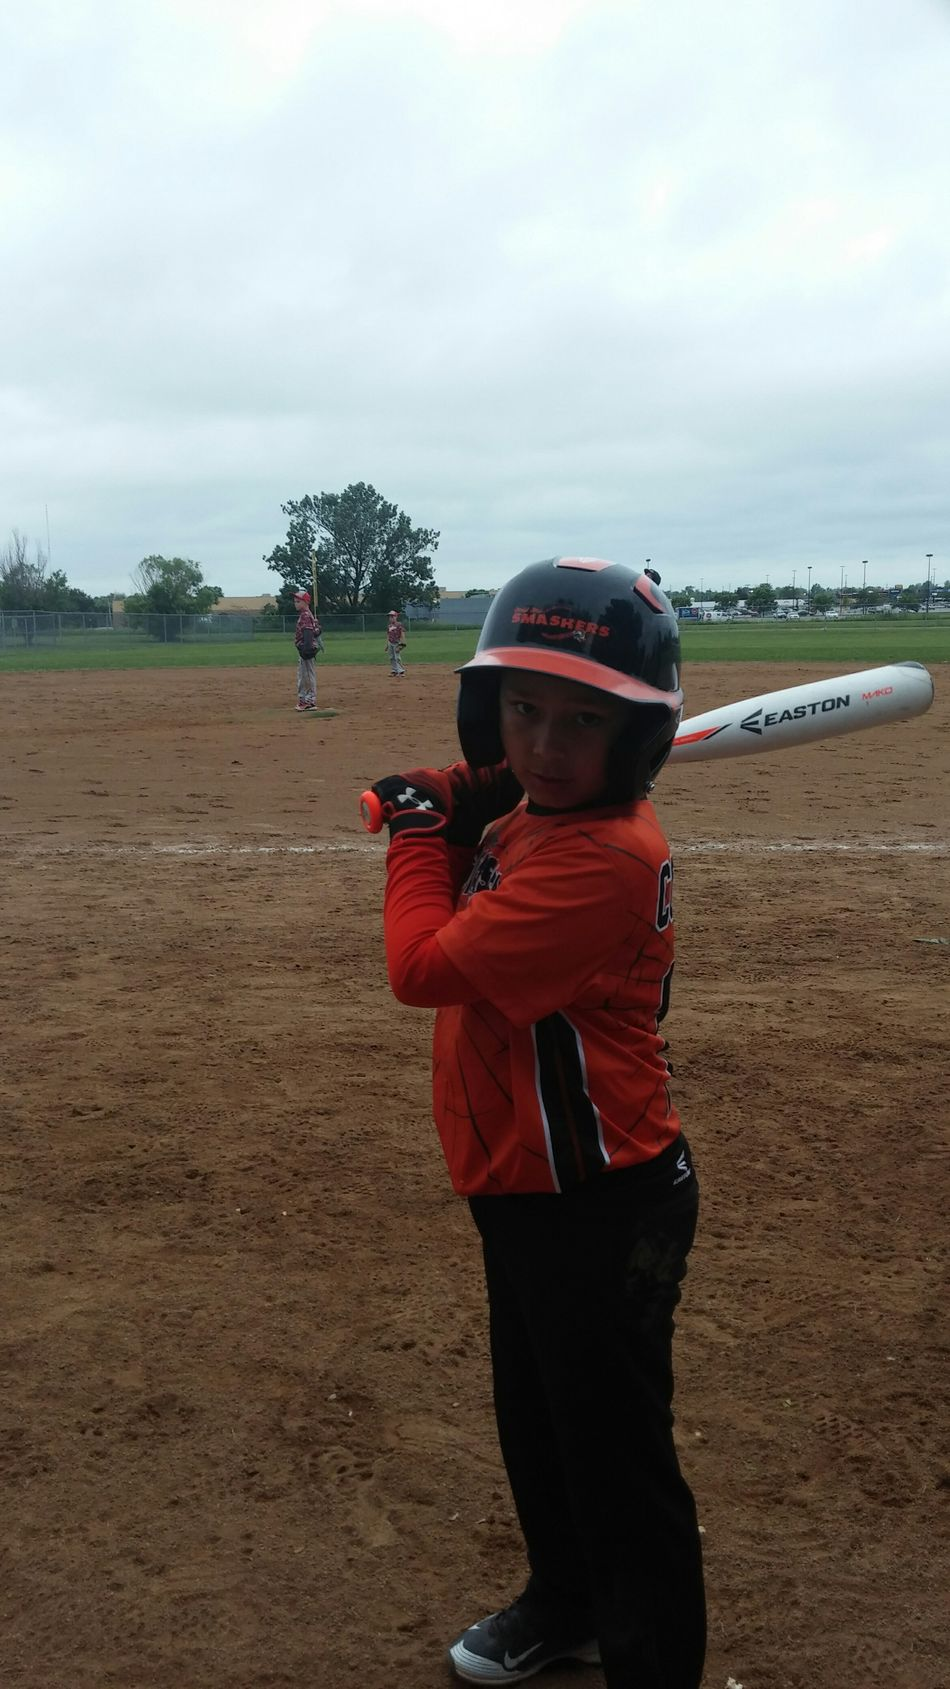 Looking serious before he hits a double. @drew1c Baseball Future Cardinal Enjoying Life Dedication Baseball Life